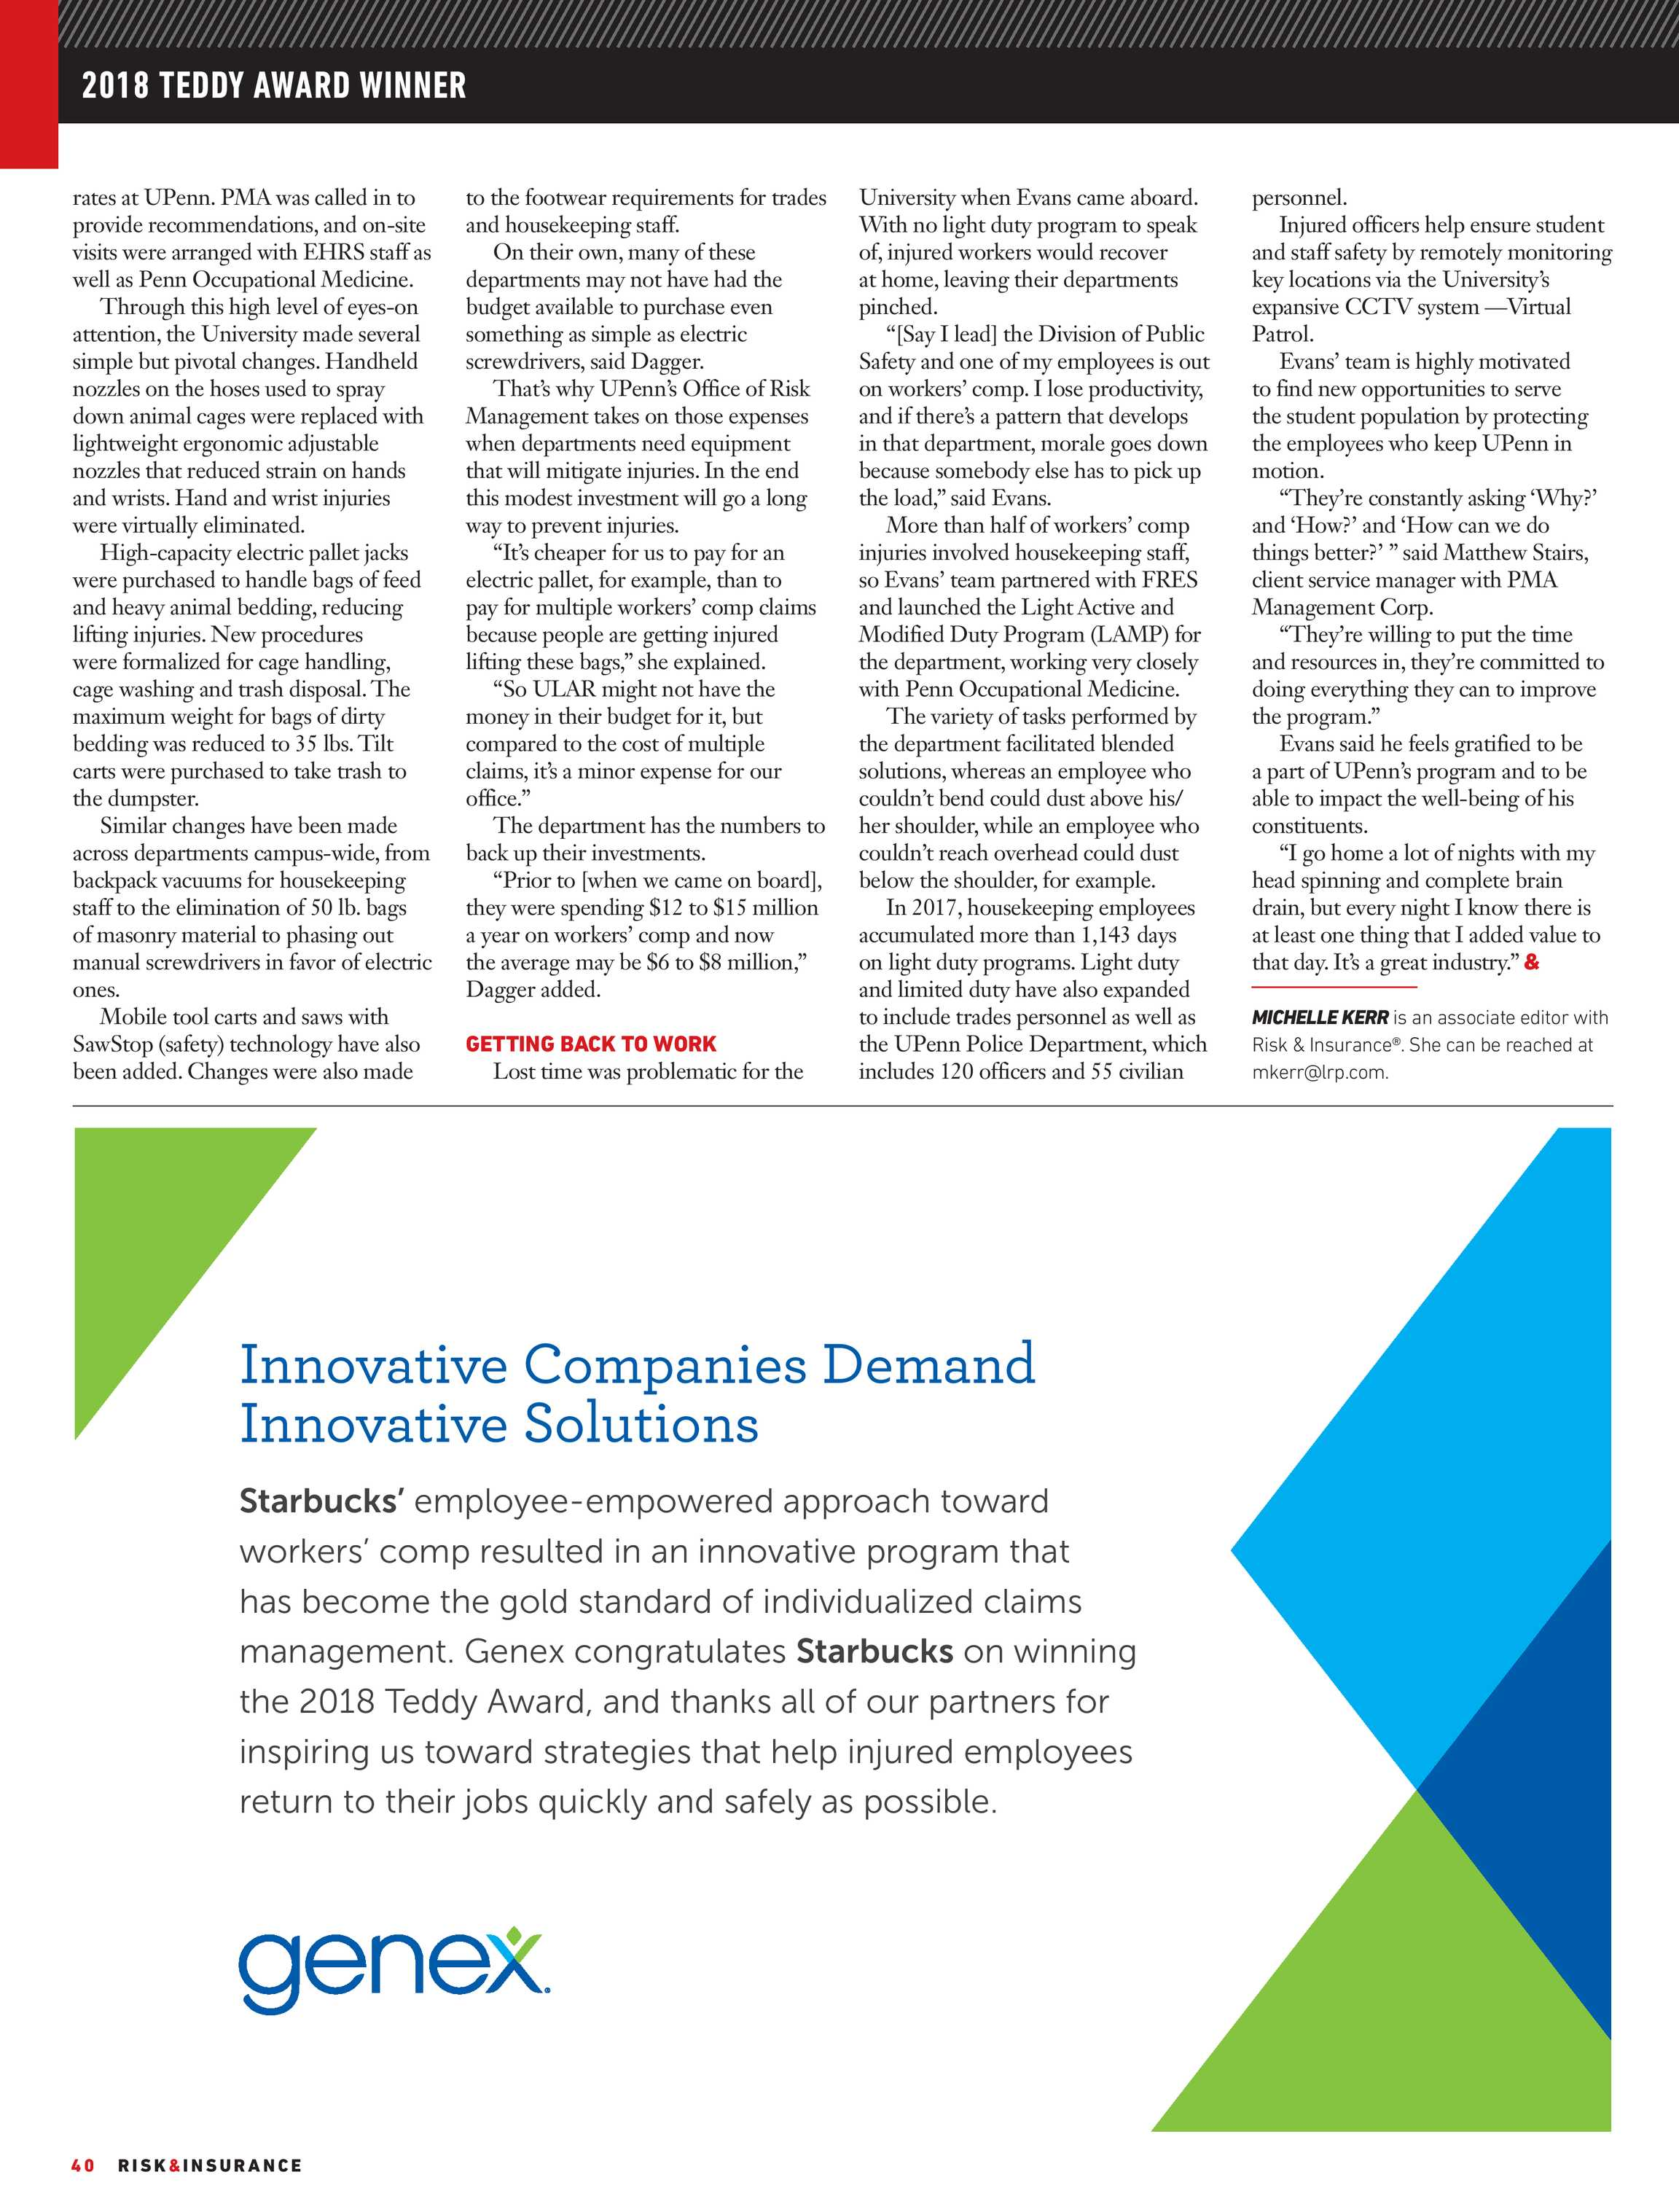 Risk & Insurance - November 2018 - page 40